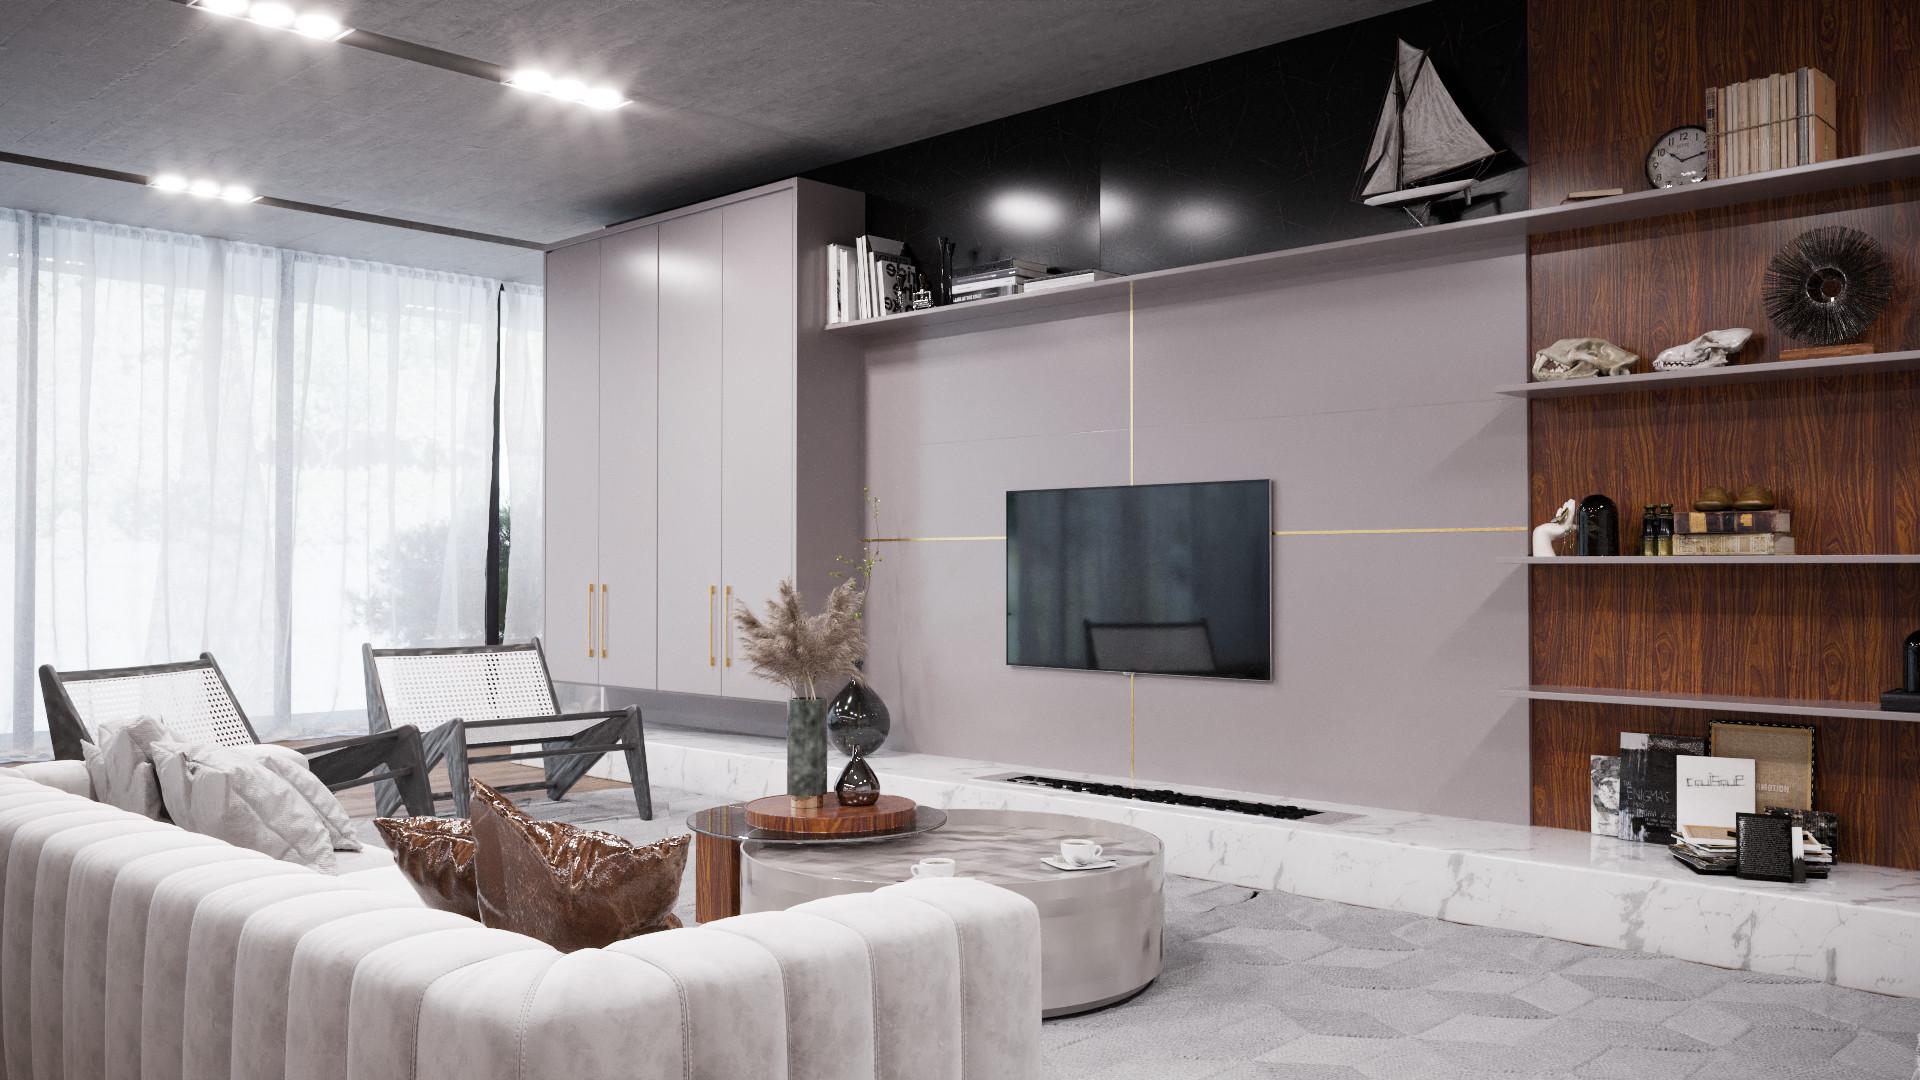 sala íntima minimalista living origens 2022